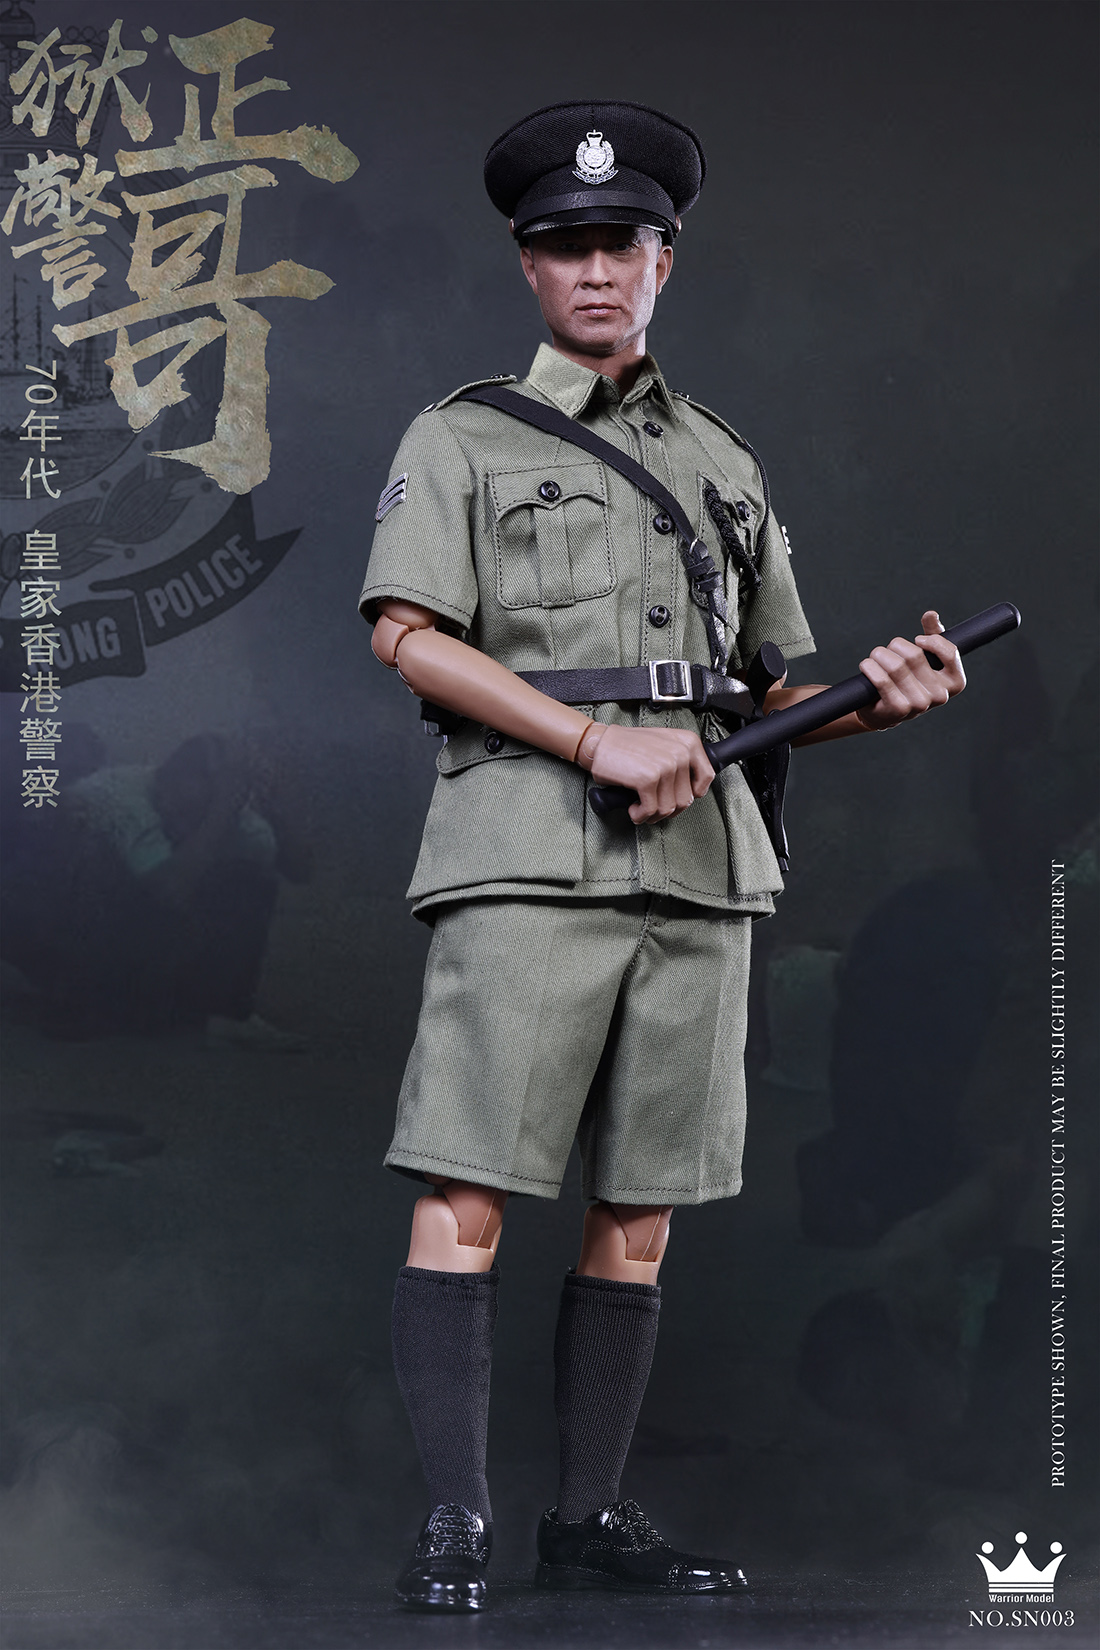 wm-hk-police01